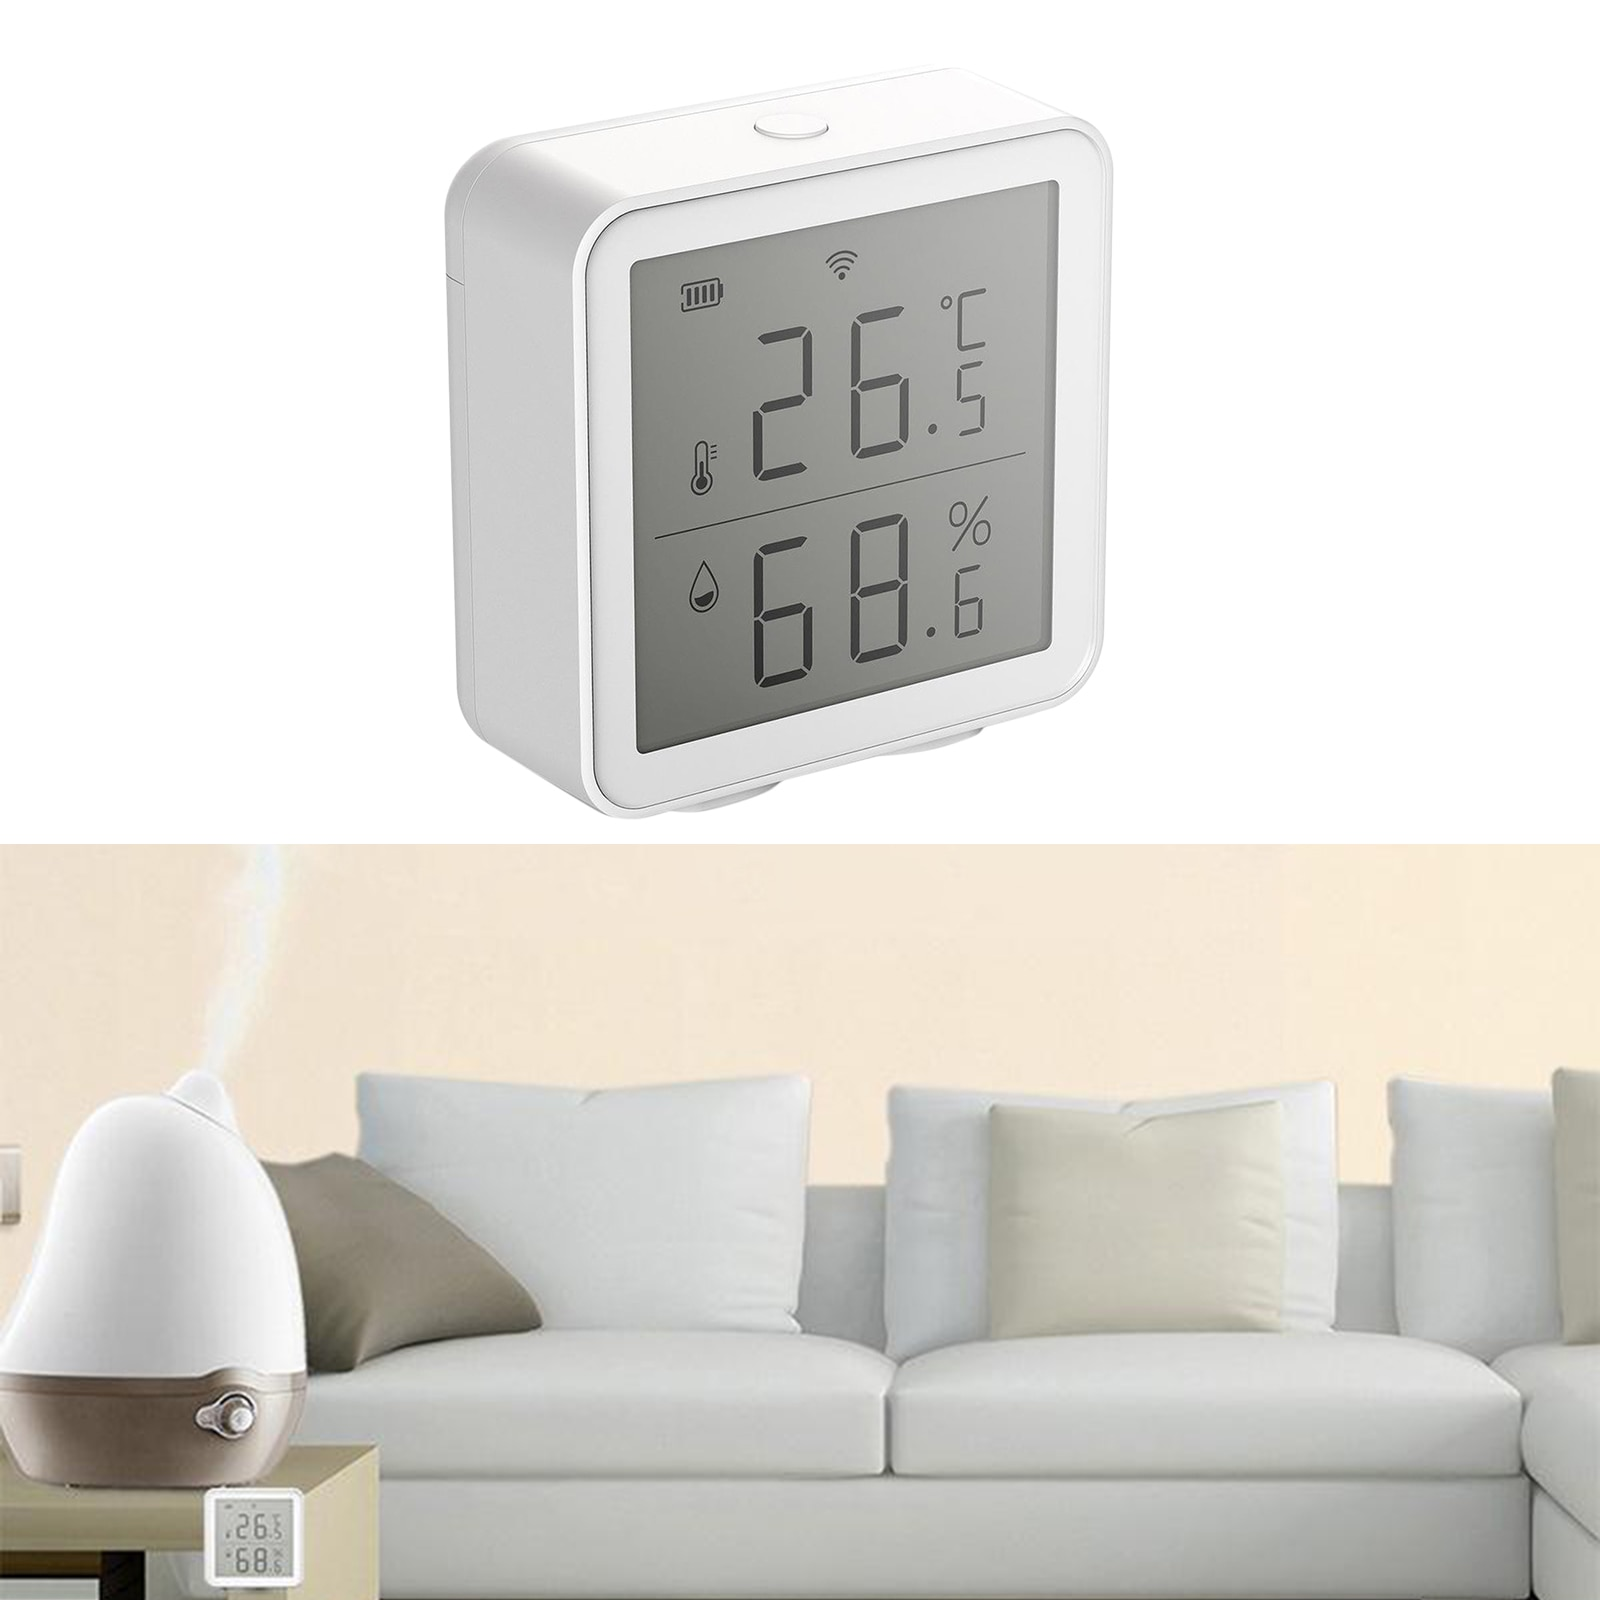 Wifi LCD Innen Thermometer Digital Hygrometer Temperatur Feuchtigkeit Display DC 4,5 V